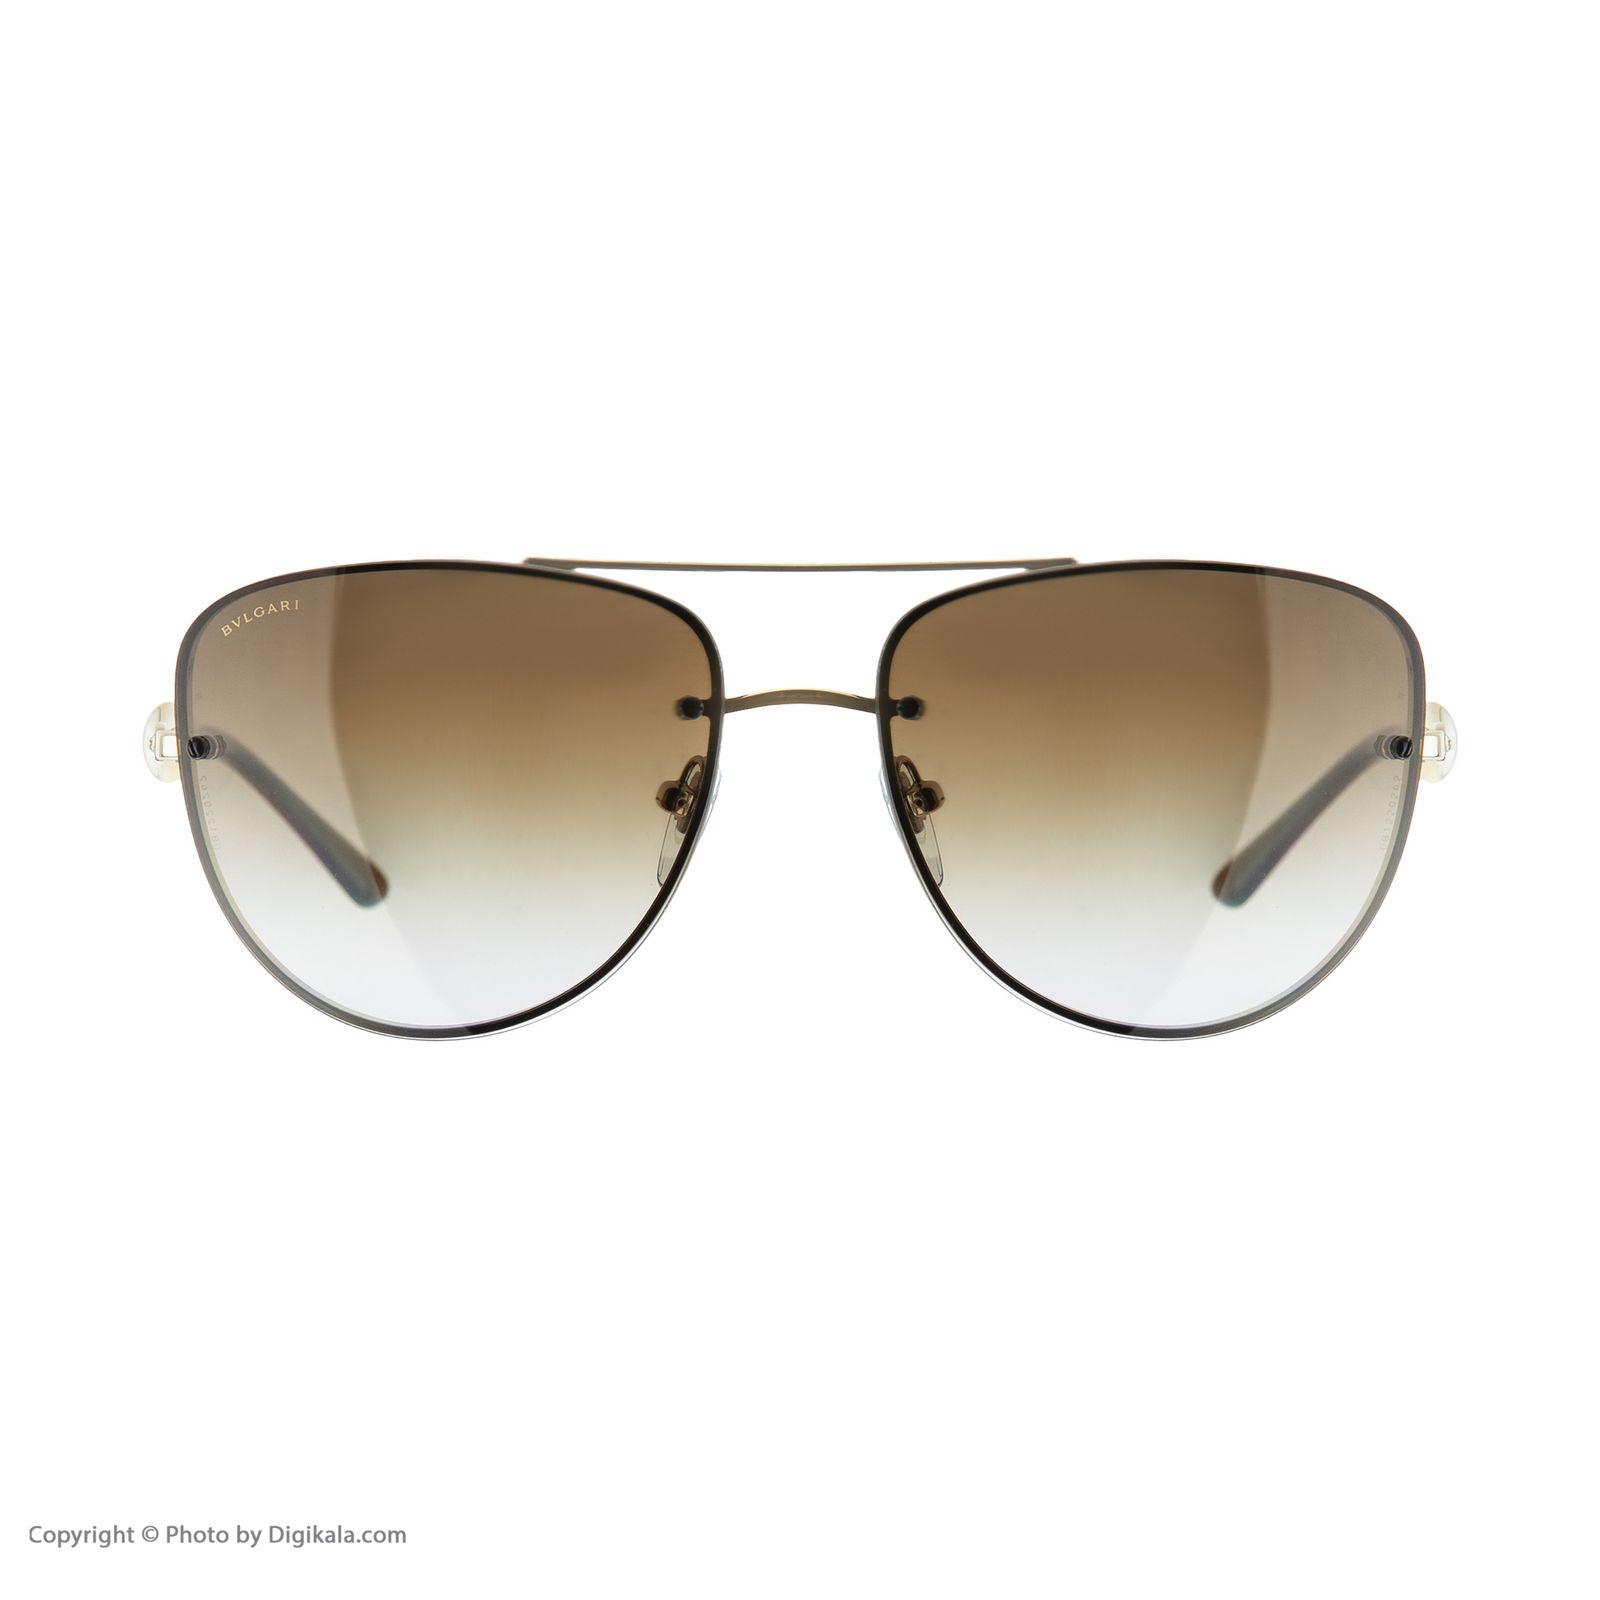 عینک آفتابی مردانه بولگاری مدل BV6086B 0278T5 -  - 3